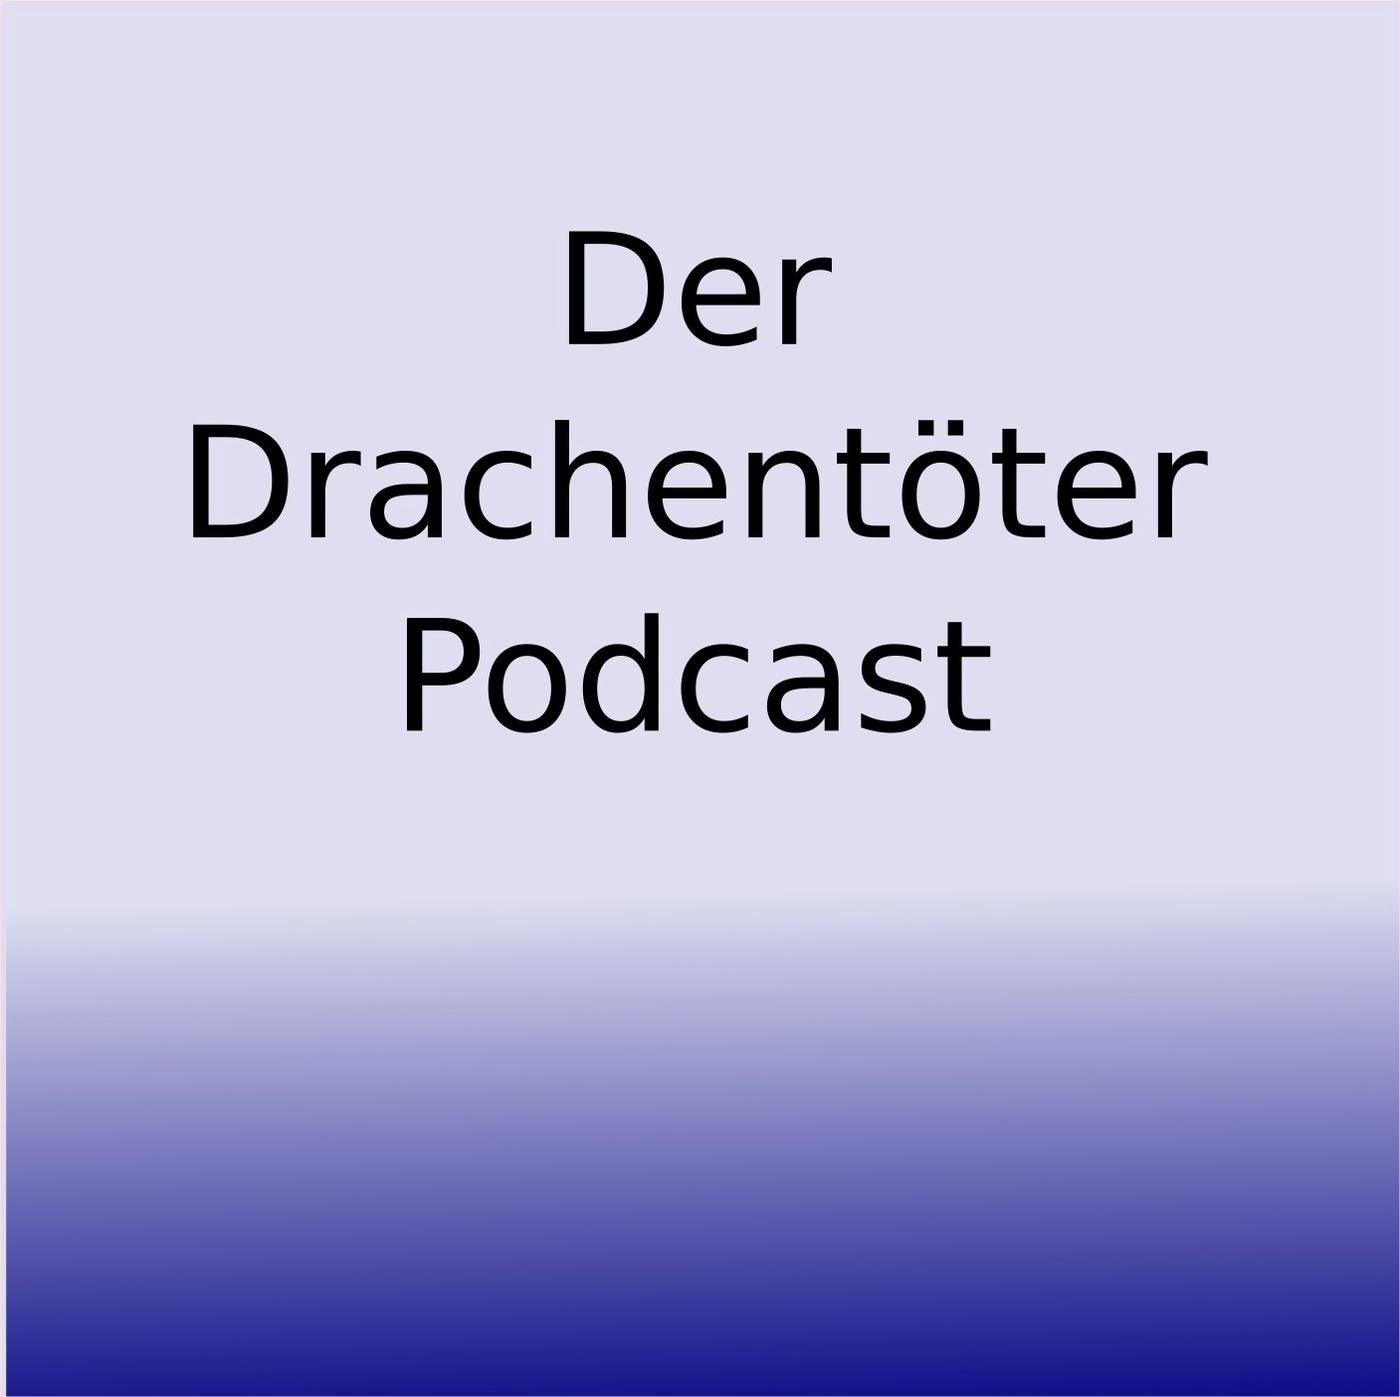 Der Drachentöter Podcast